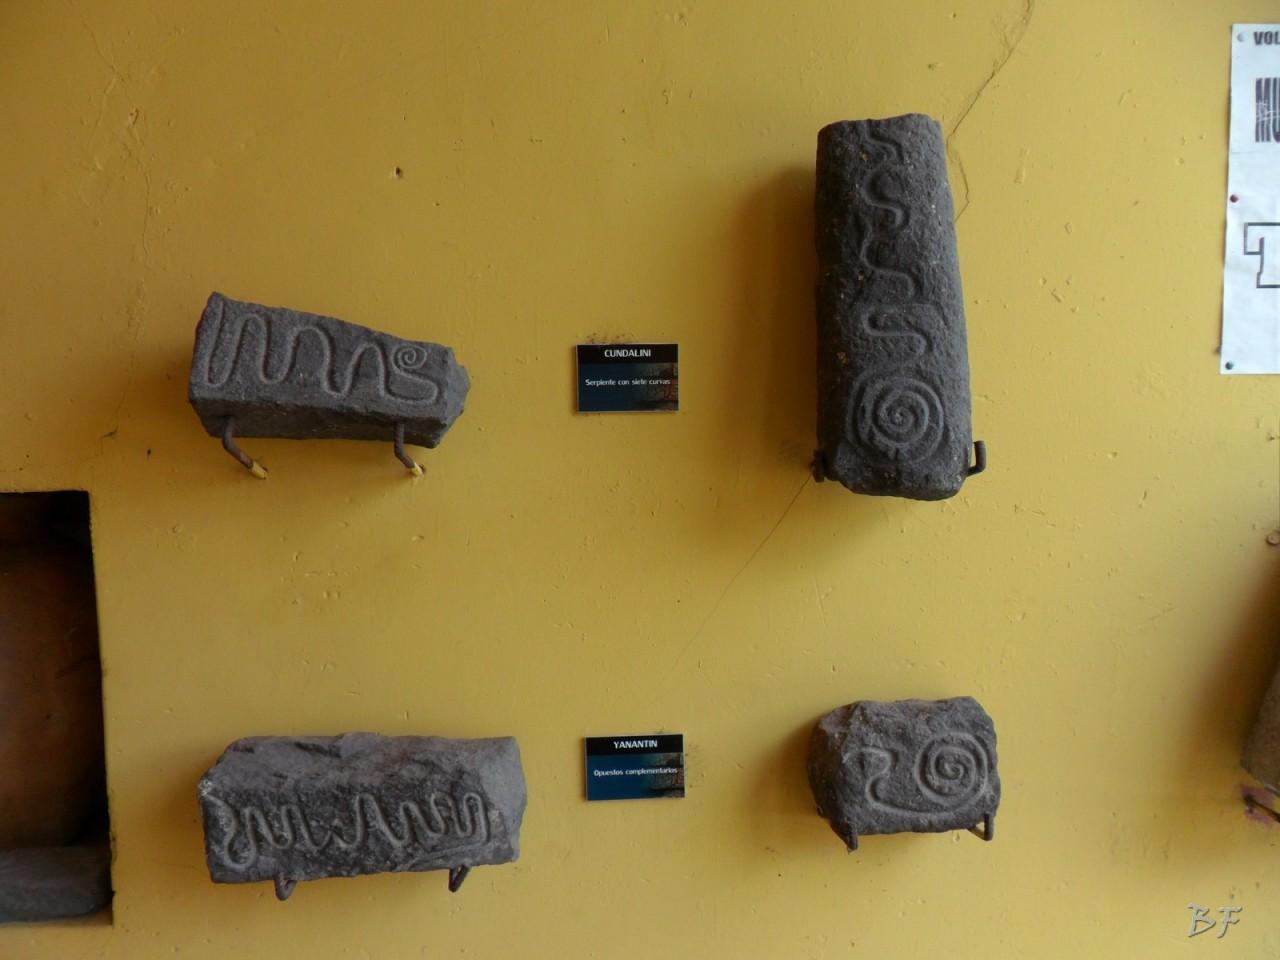 Museo-Andahuaylillas-Teschi-allungati-Cusco-Perù-4